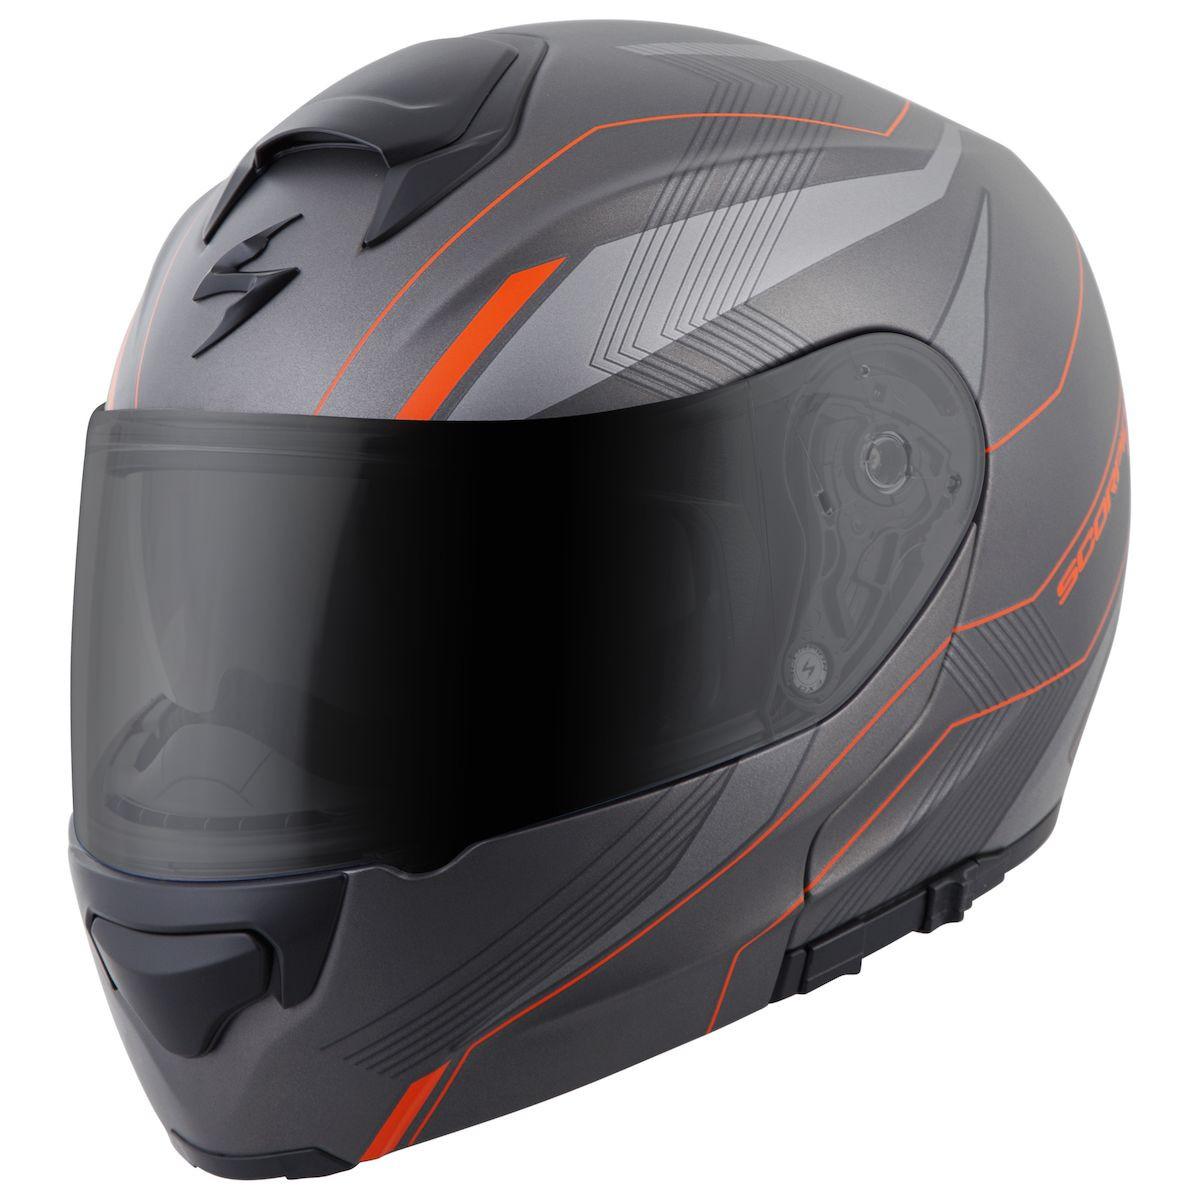 scorpion exo gt3000 sync helmet motorcycle house. Black Bedroom Furniture Sets. Home Design Ideas